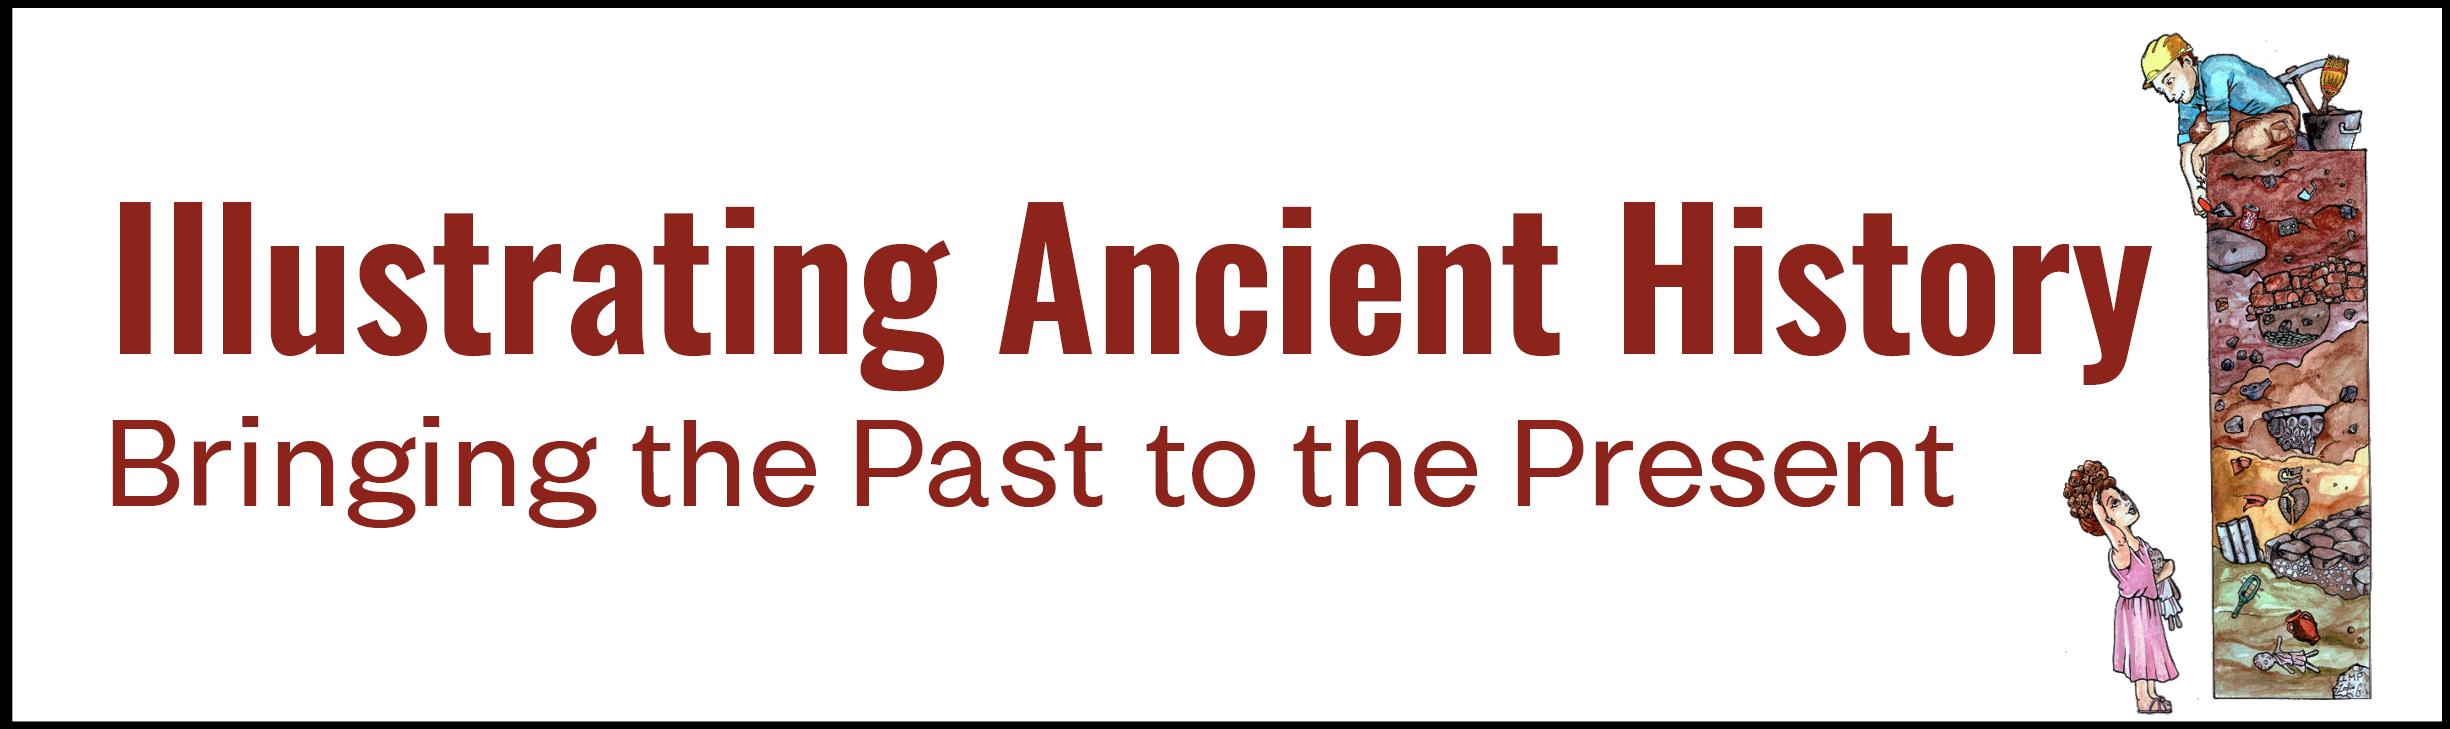 Illustrating Ancient History